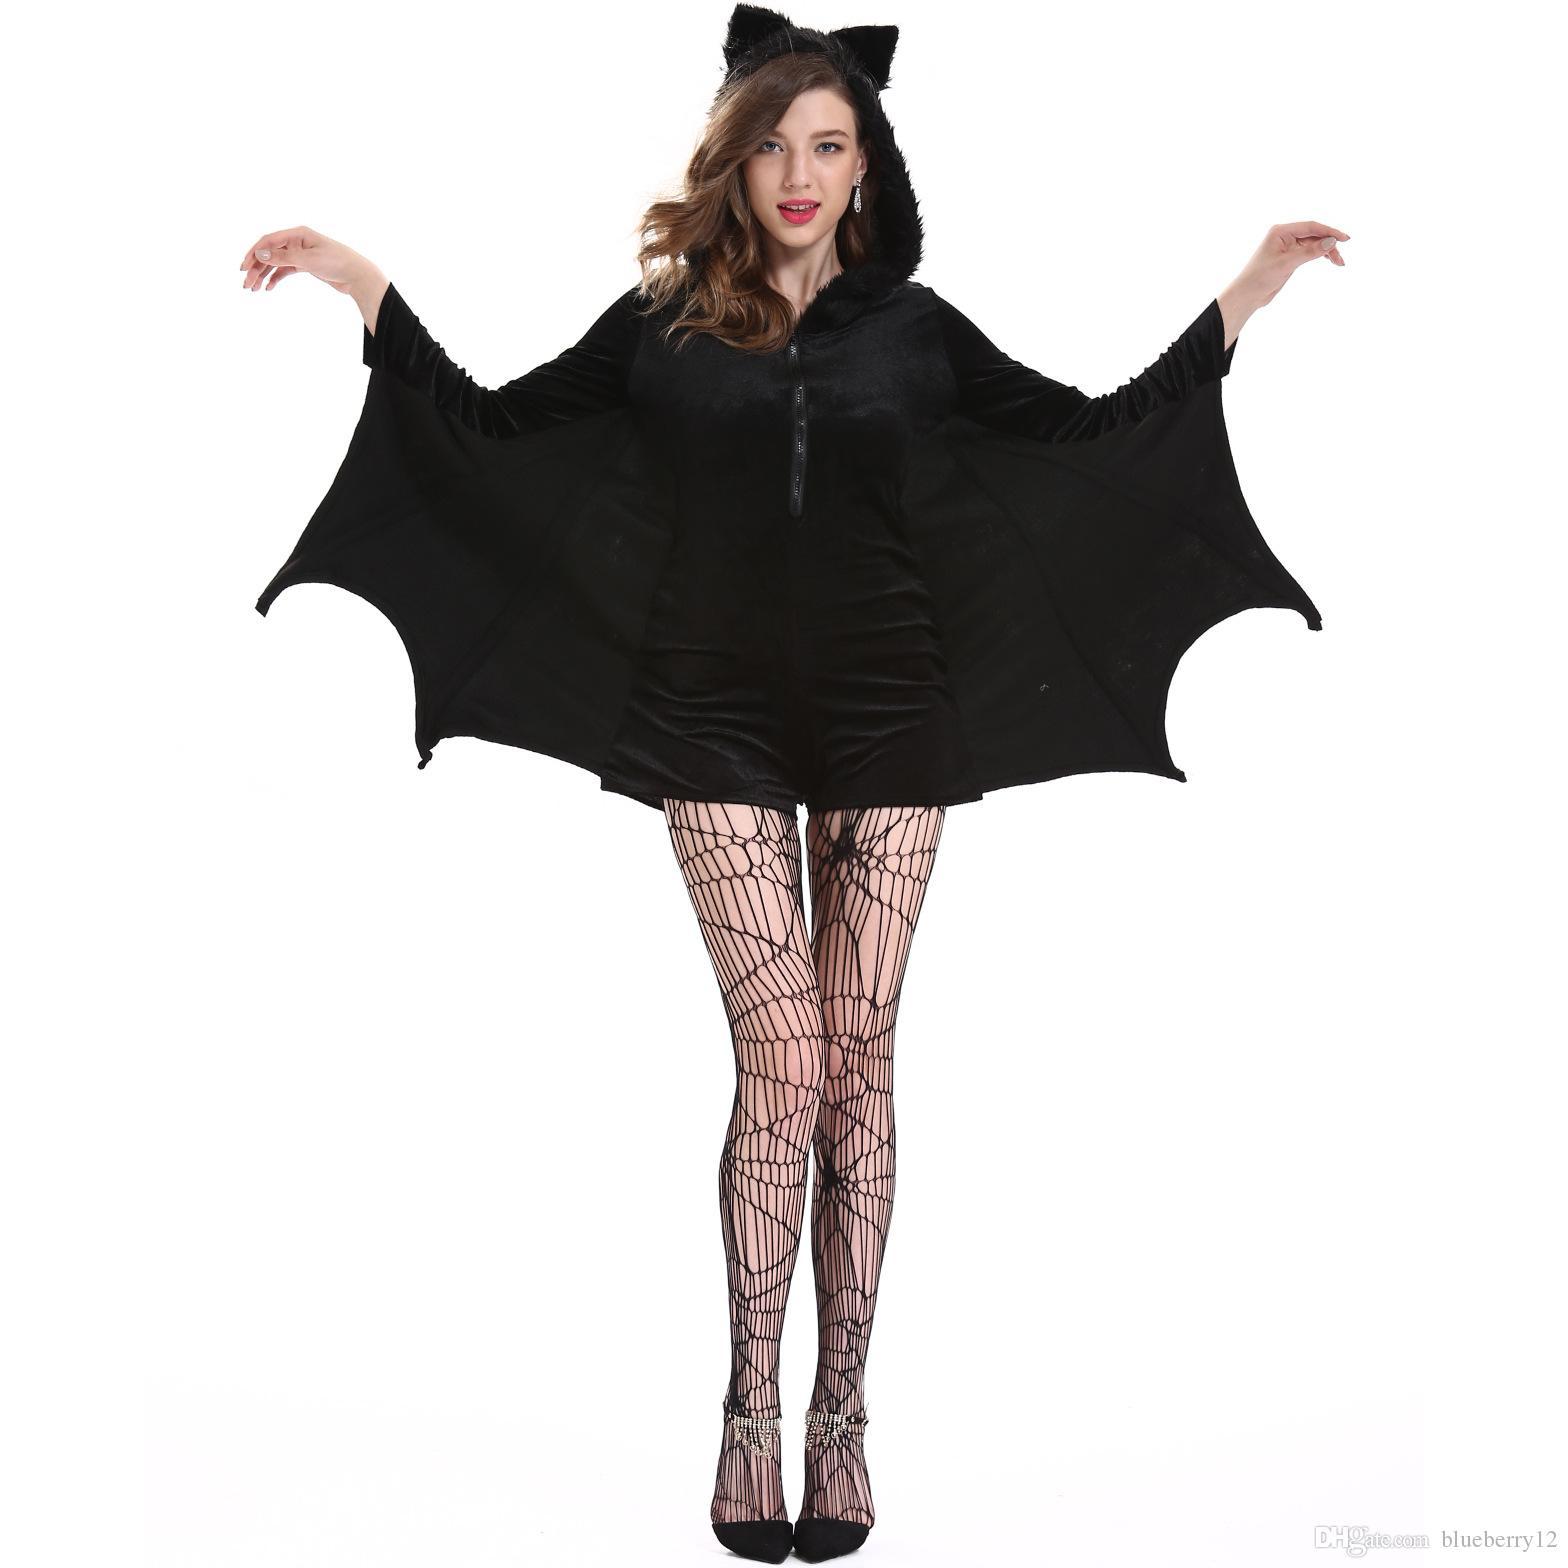 Новый горячий Halloween Cosplay партии Призрак костюм человека костюм вампира Halloween Scare Performance Одежда Носите Suit Взрослые